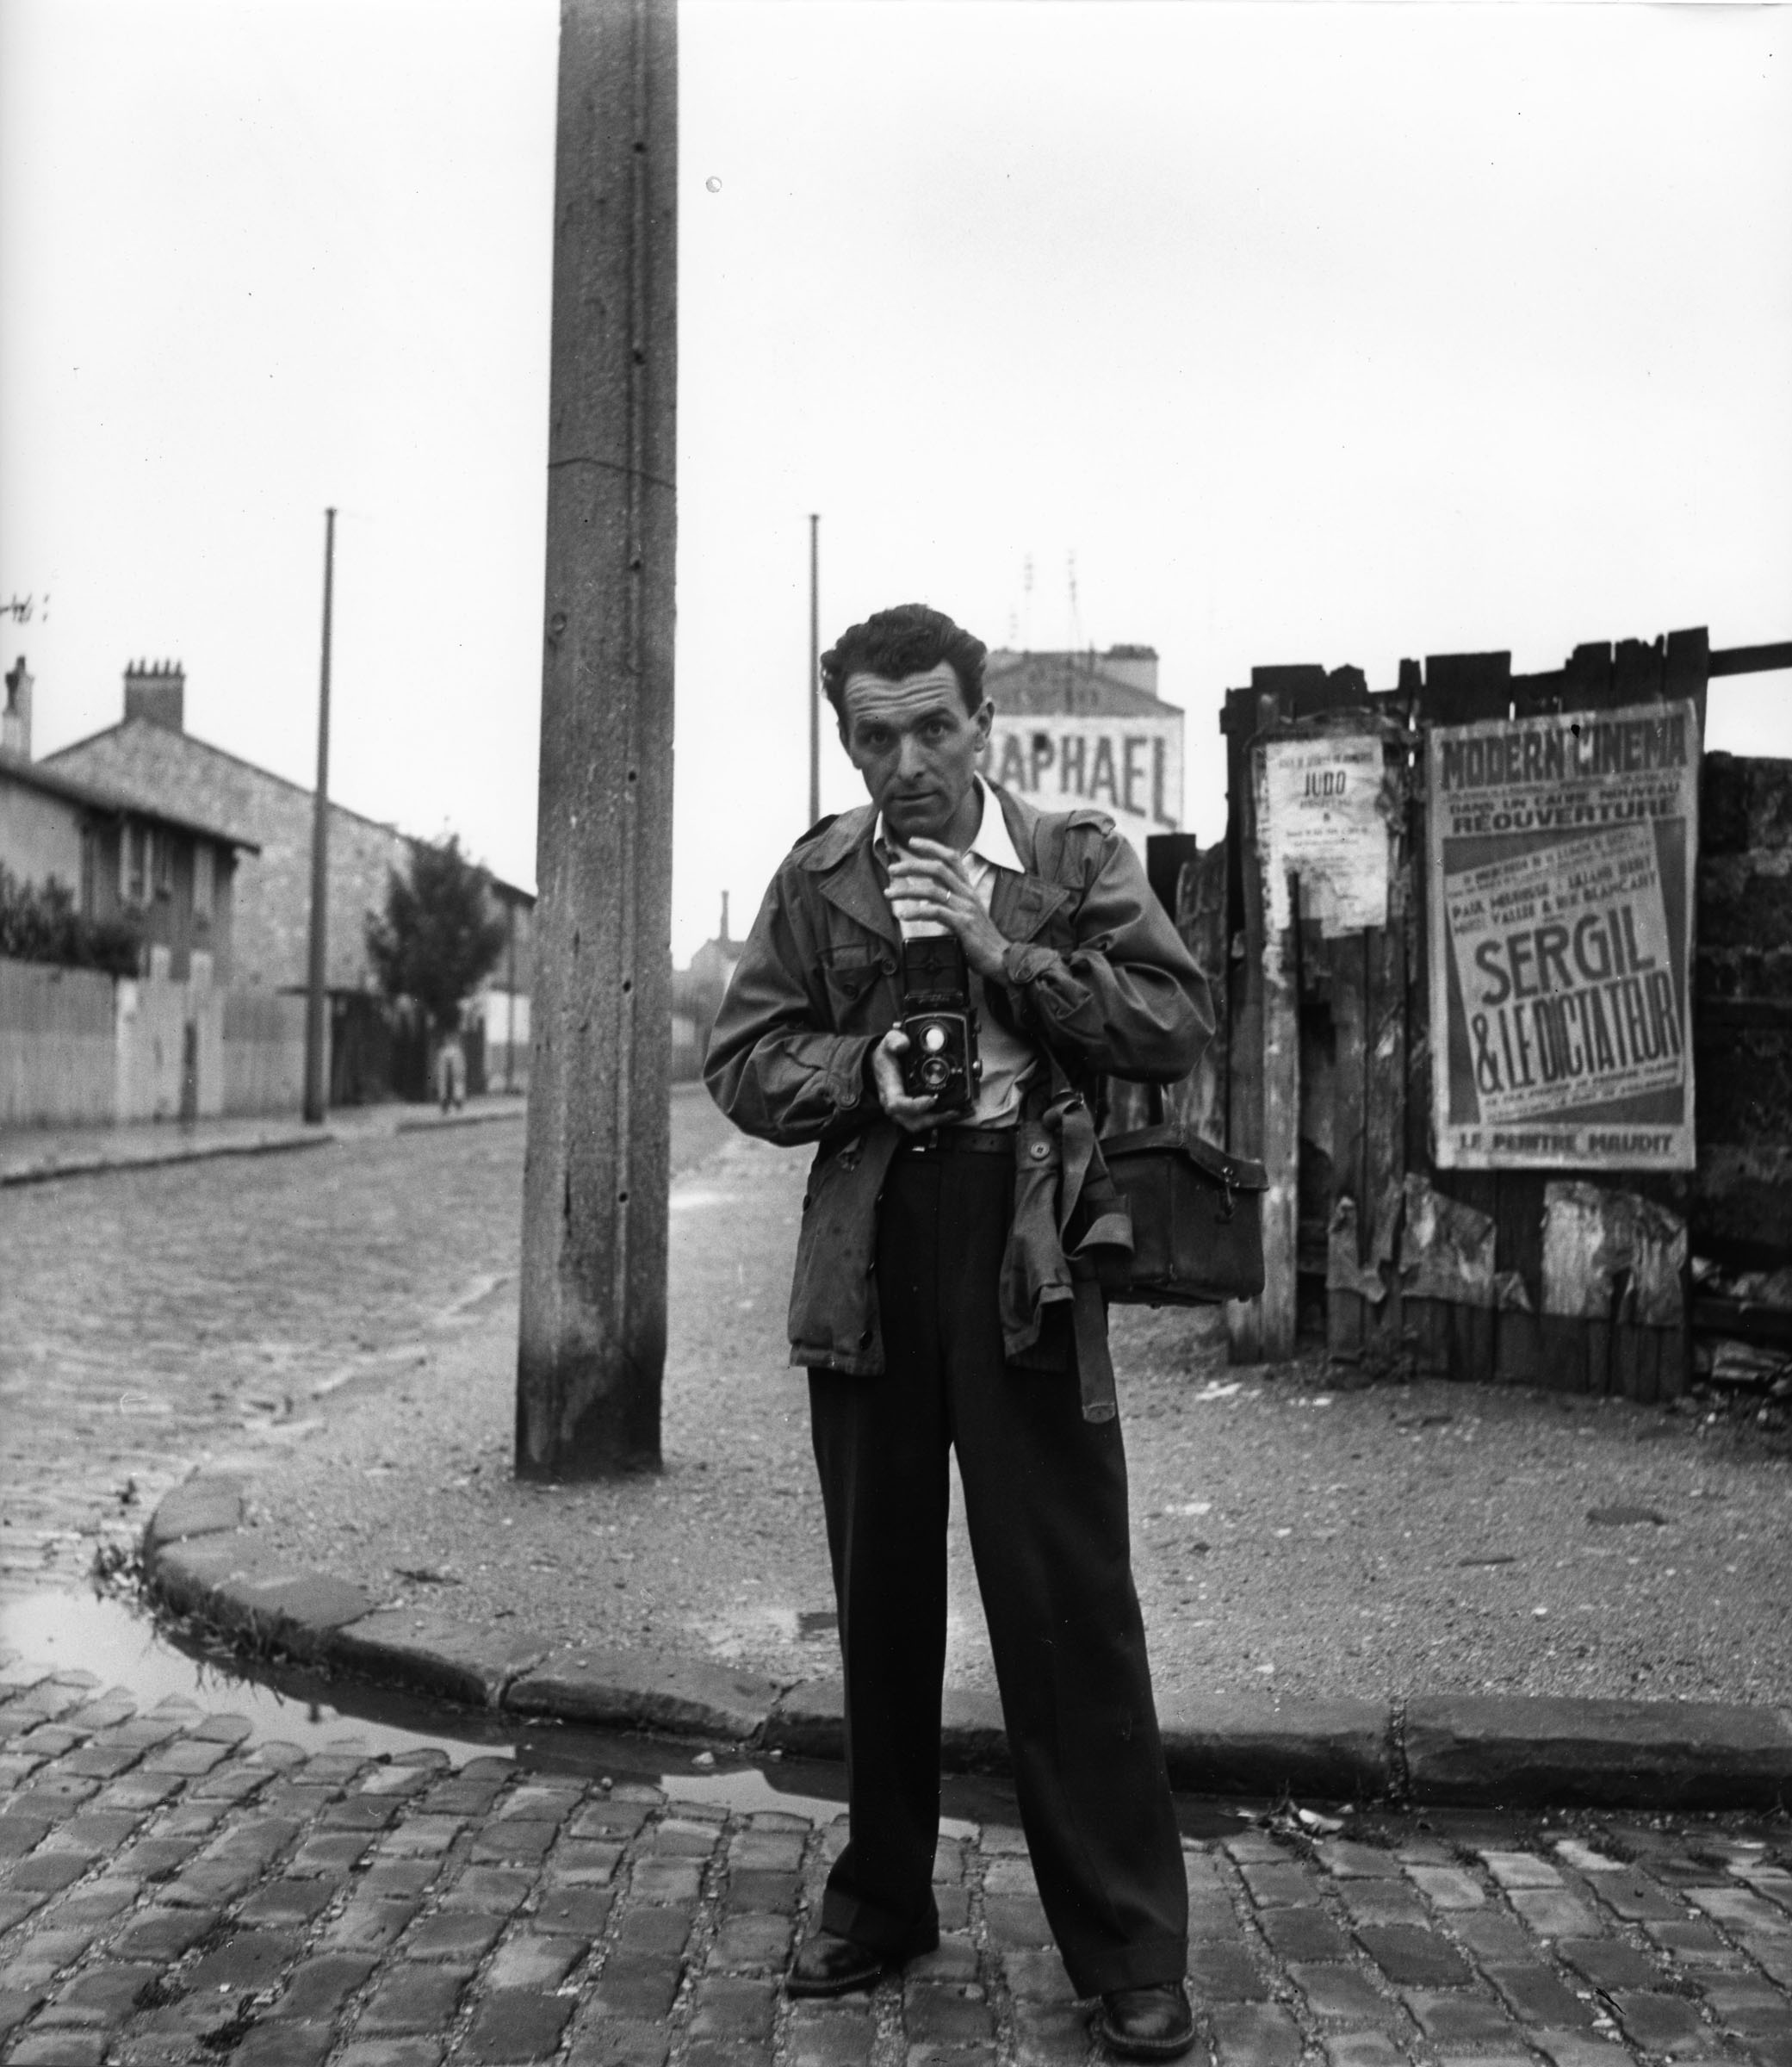 Fotografo Cava Dei Tirreni robert doisneau, pescatore d'immagini – james magazine